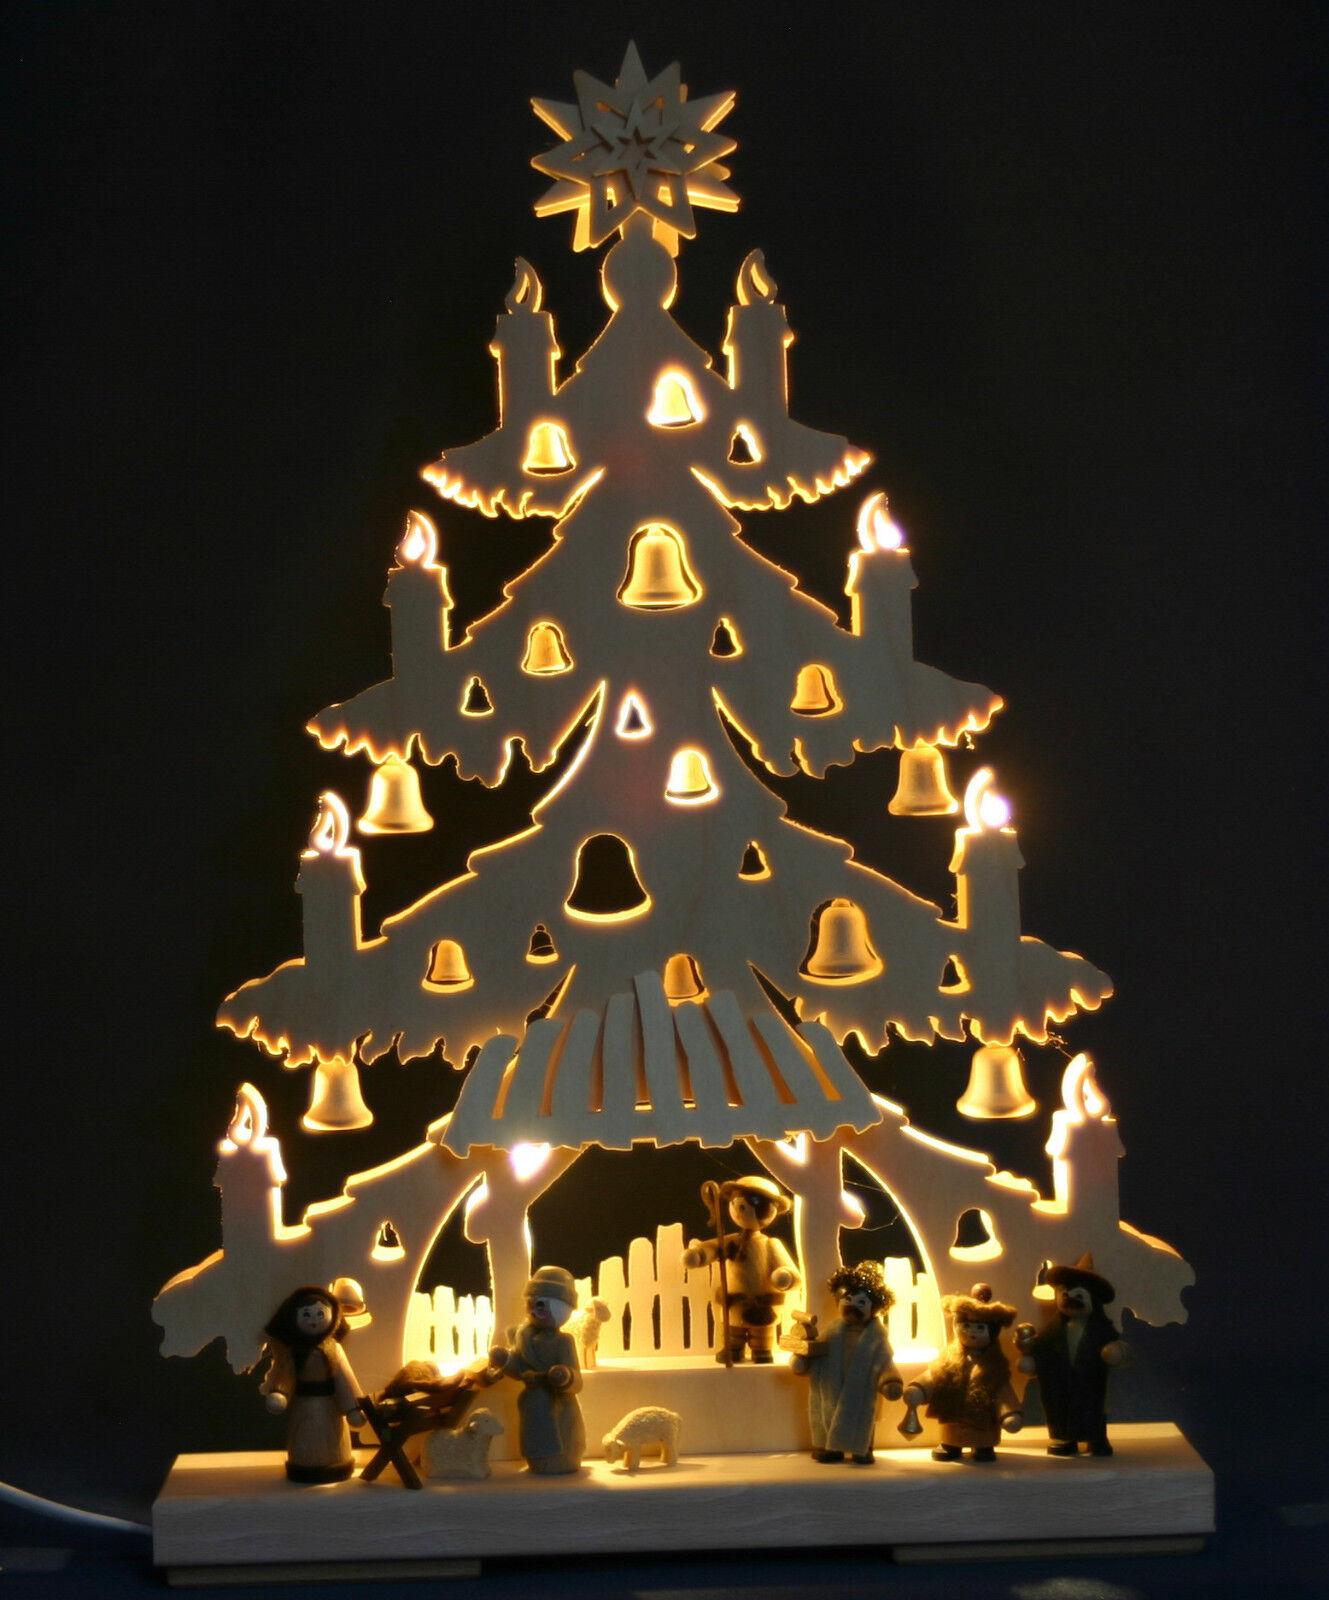 LED 3d-Schwibbogen abeto navidad pesebre tannebaum nacimiento de Cristo Erzgebirge